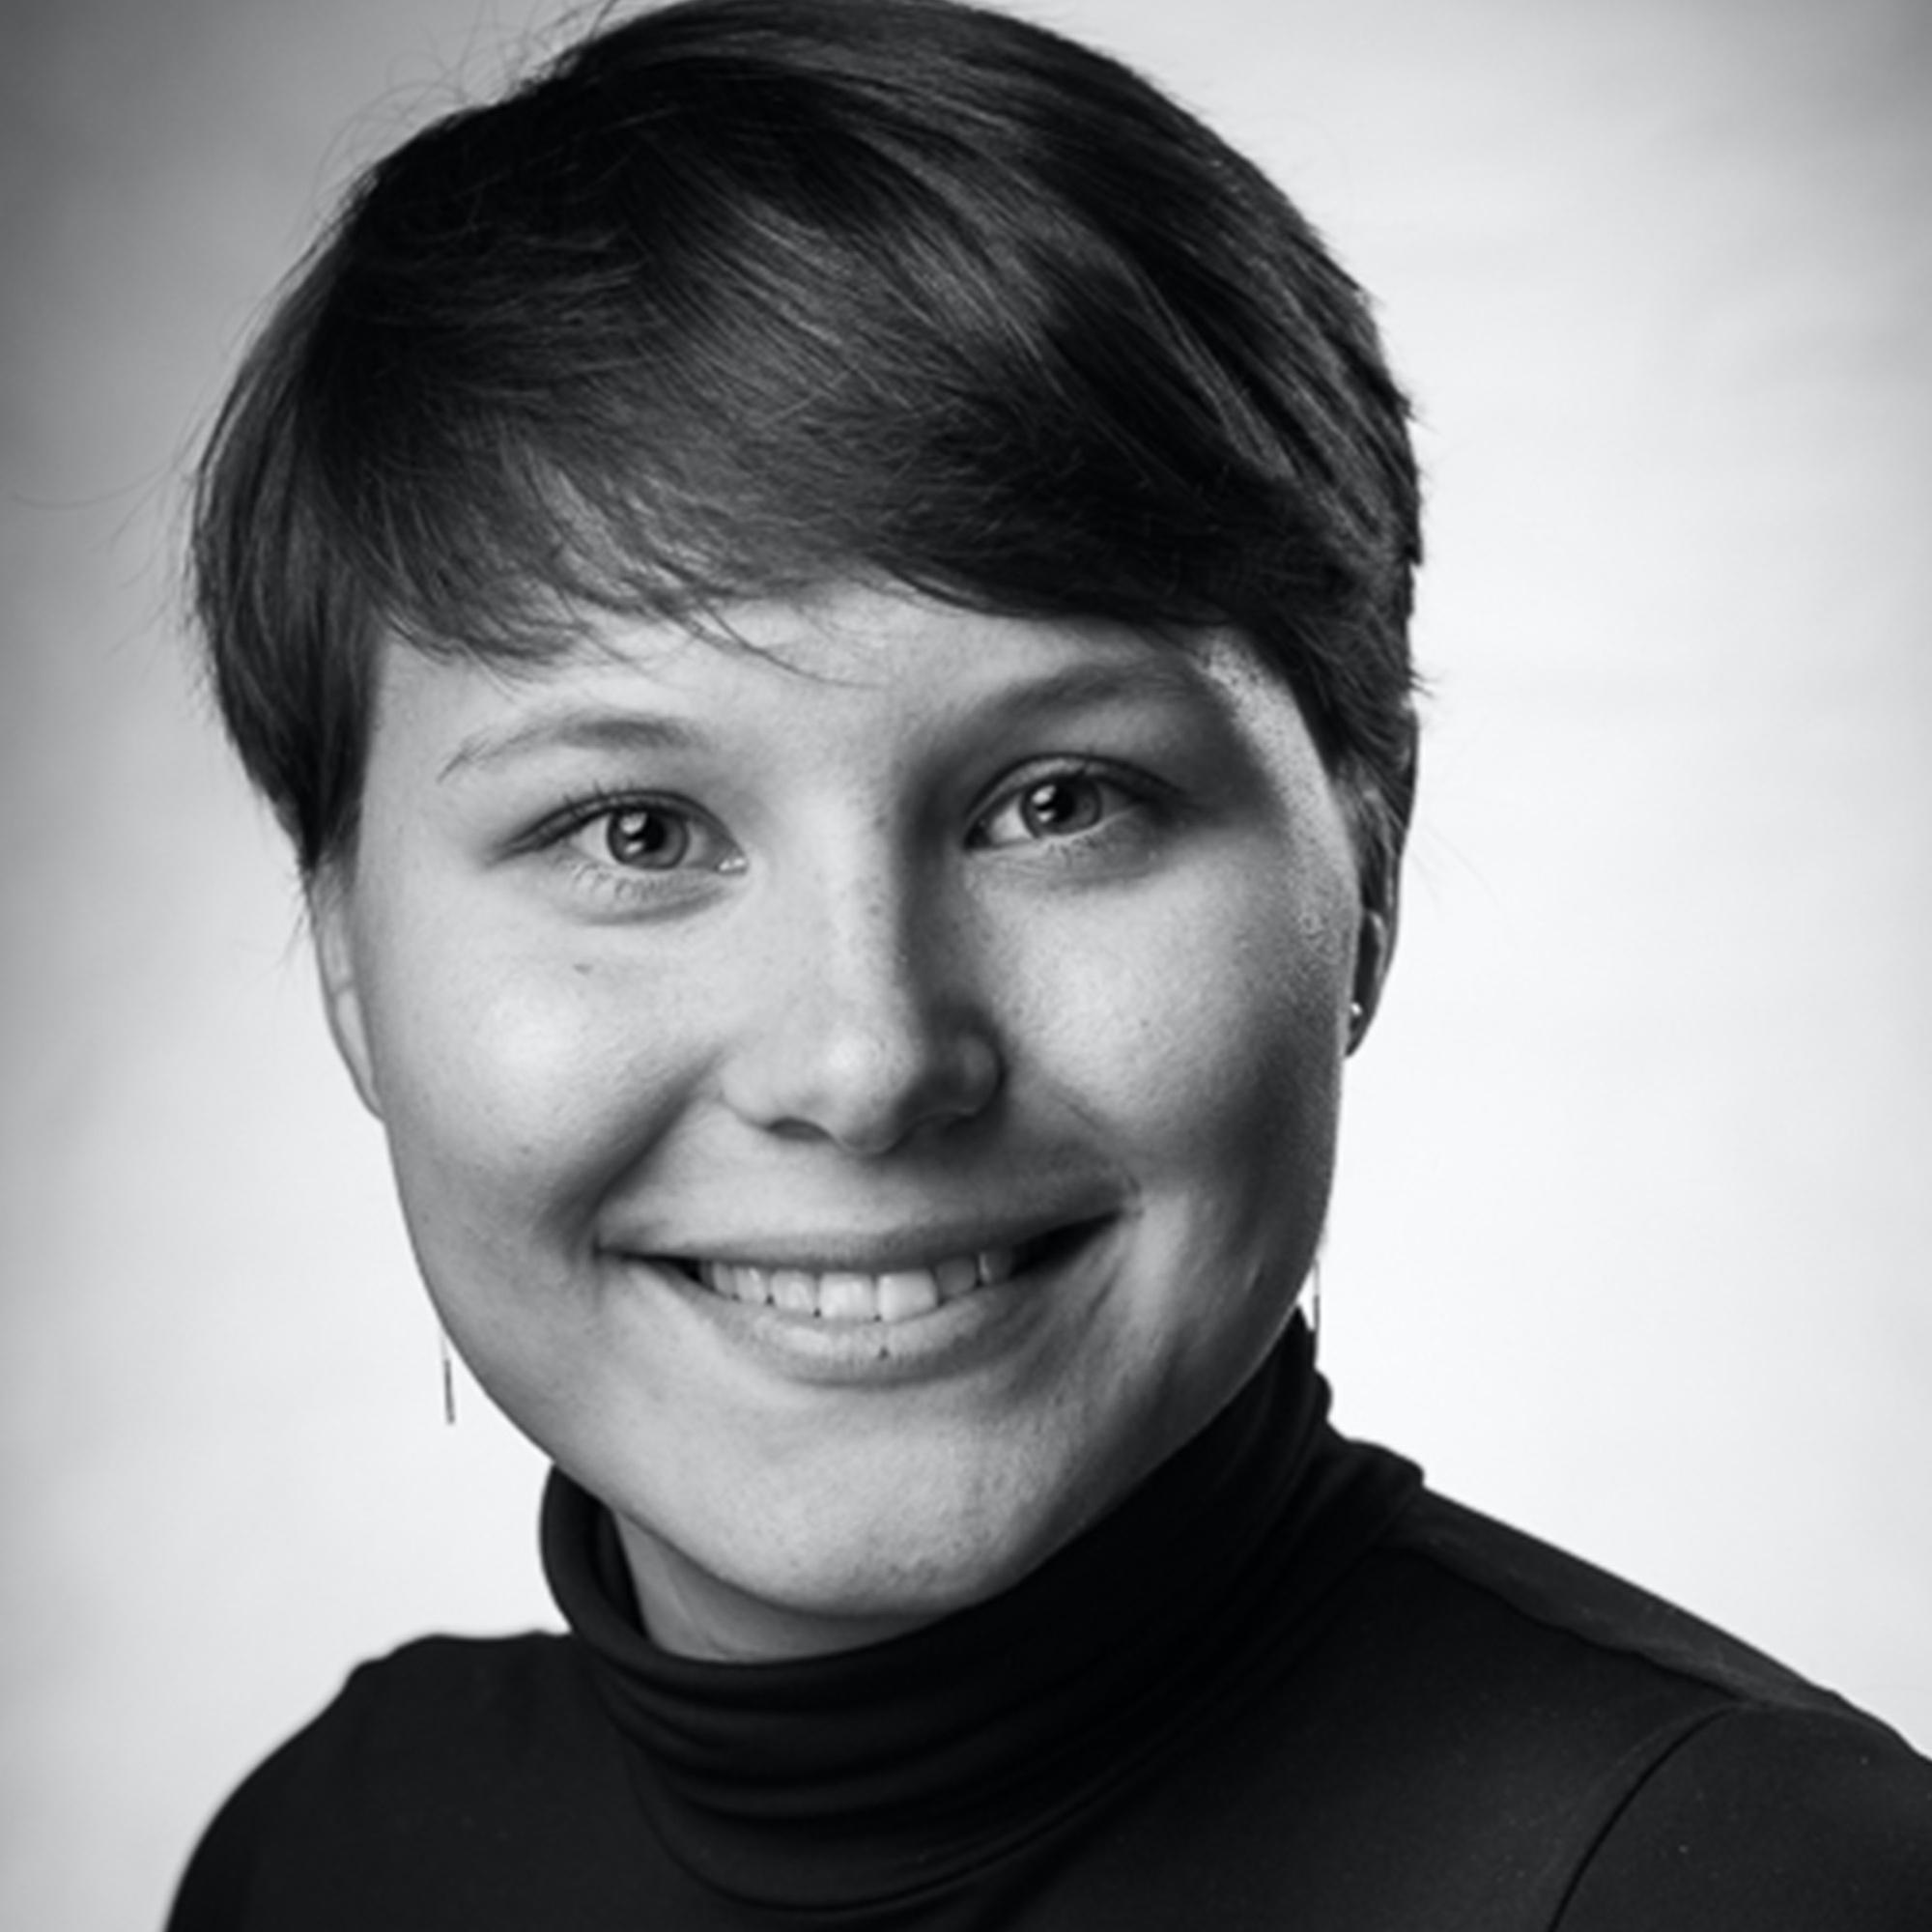 Maryia Rusak